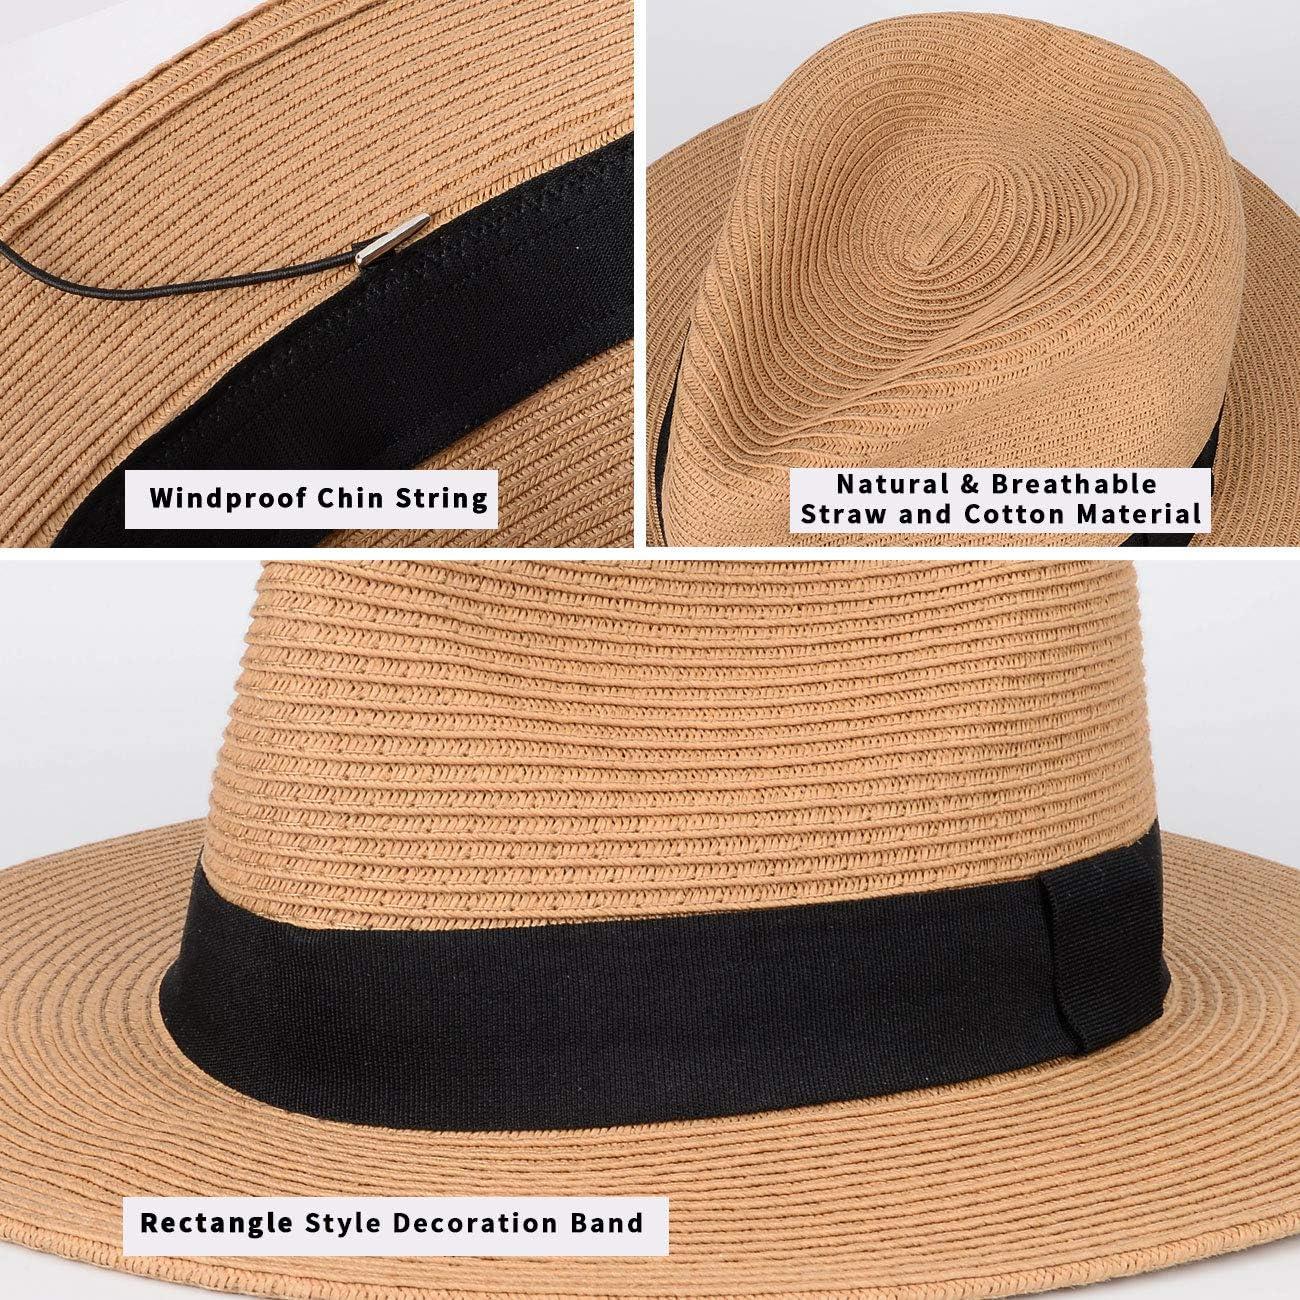 con fascia nera regolabile Maylisacc Cappelli Panama arrotolabili da uomo a tesa larga estivi traspiranti